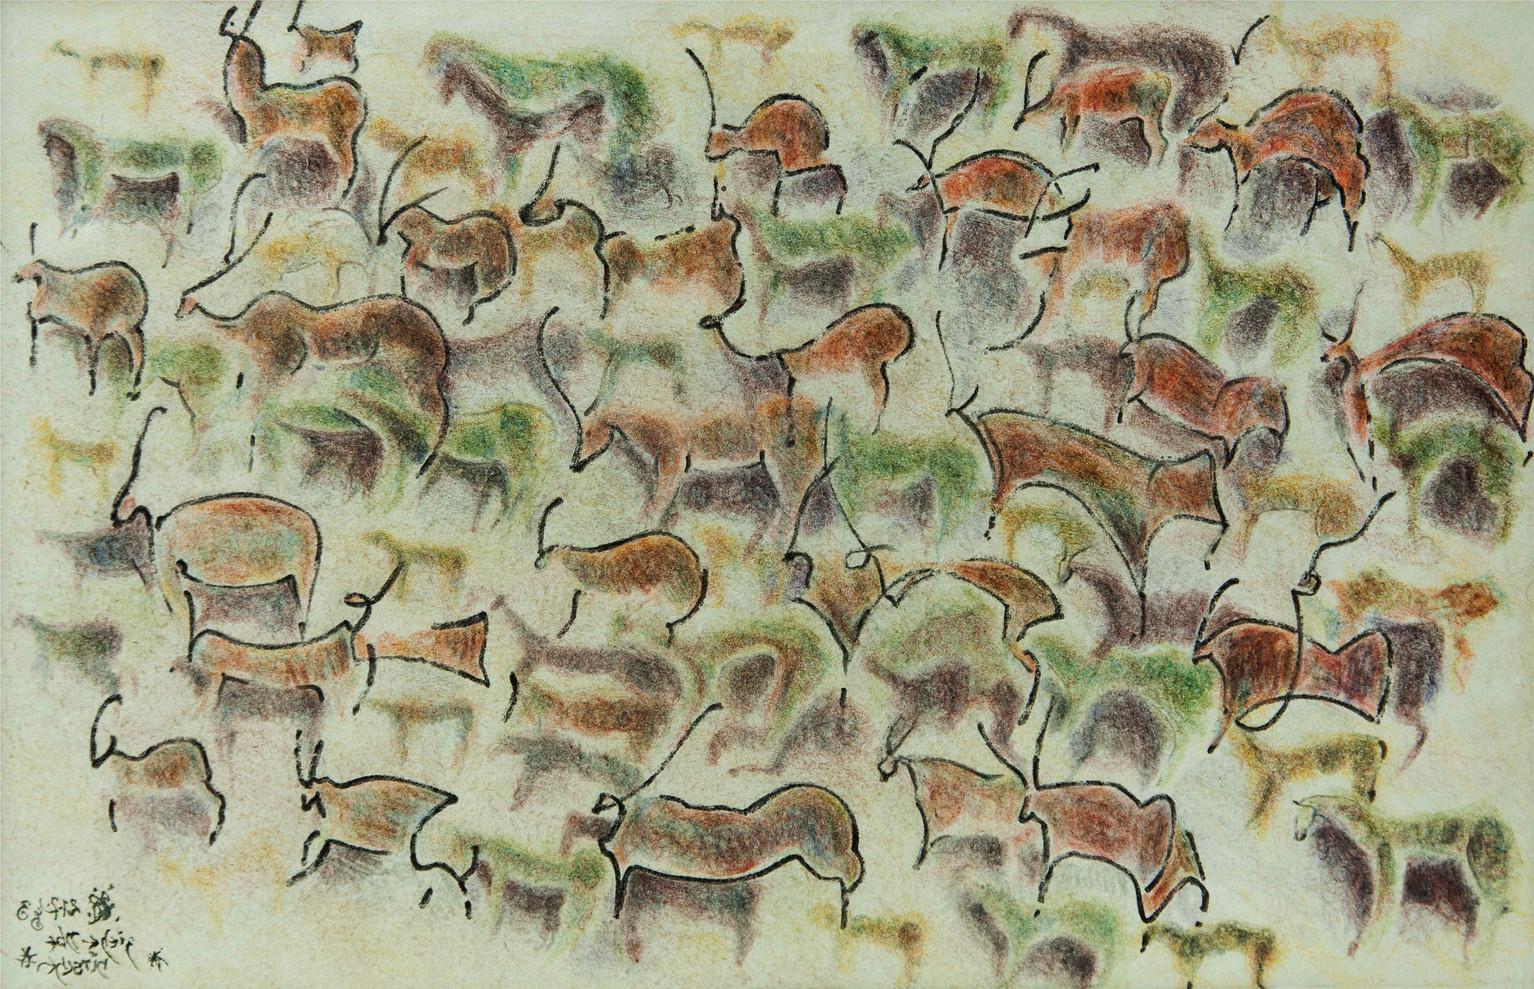 02_Ziehende Hirsche, 1983, Tinte u. Bunt